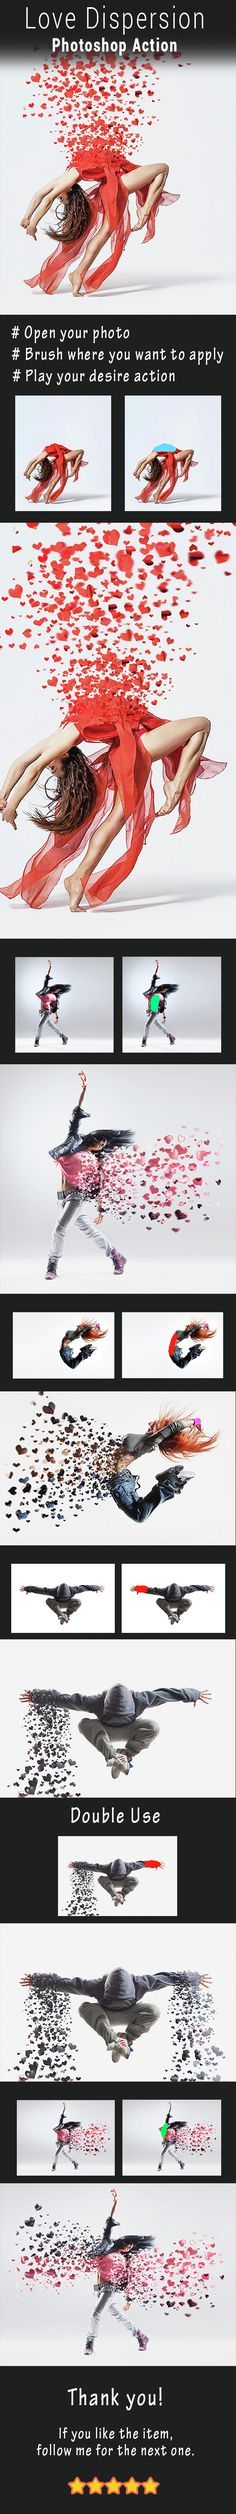 Love Dispersion Photoshop Action